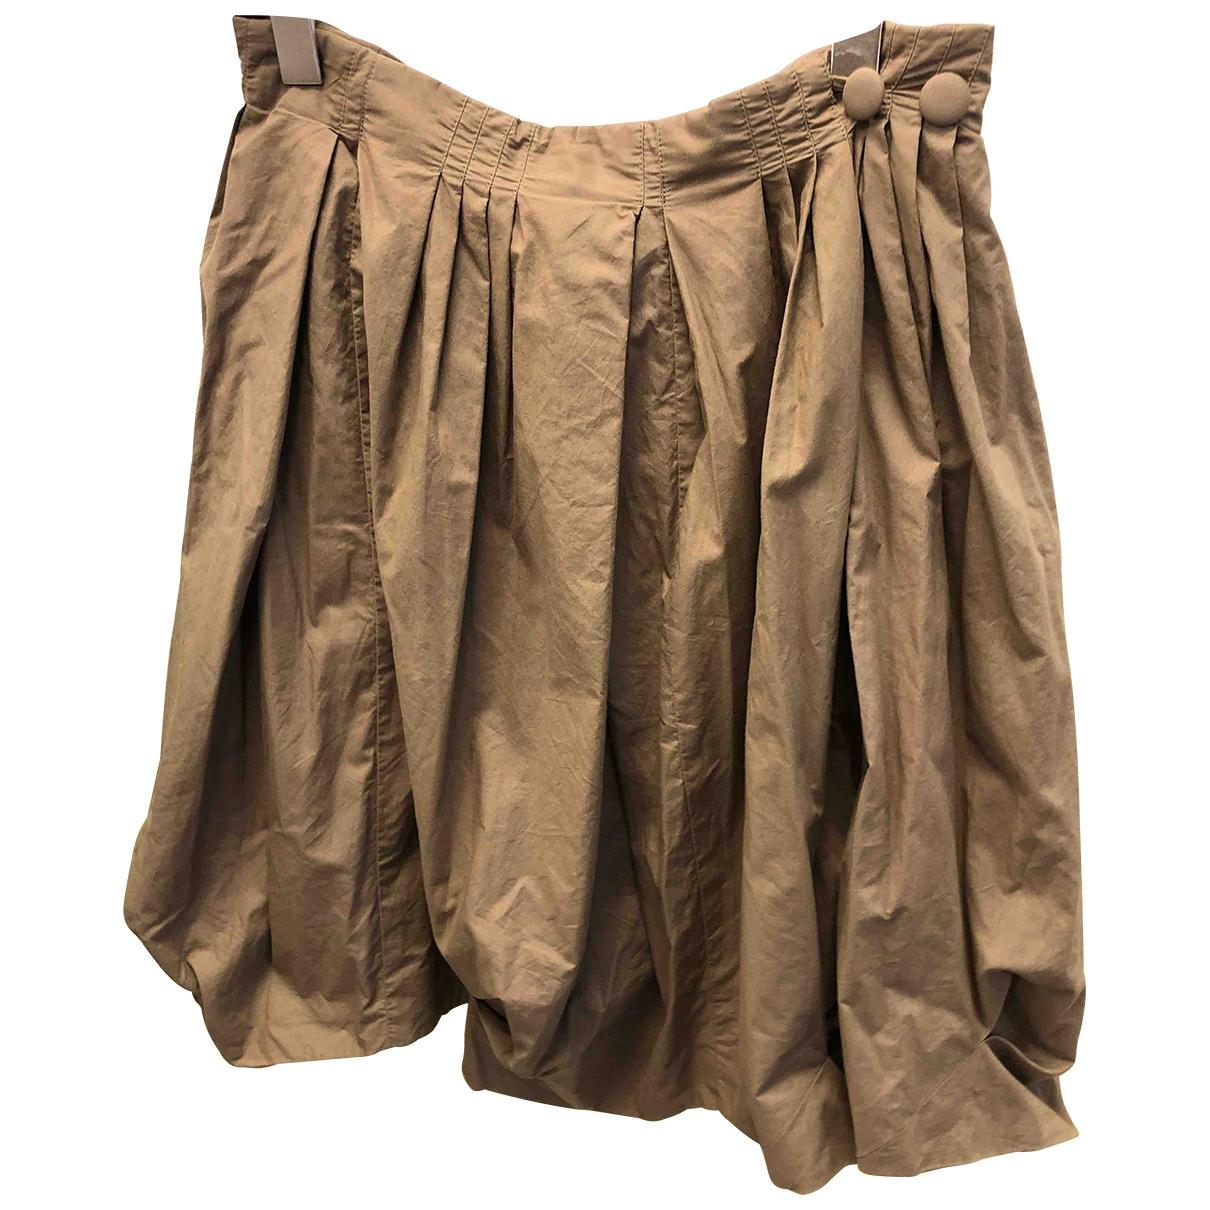 Acne Studios \N Khaki Cotton skirt for Women 36 IT